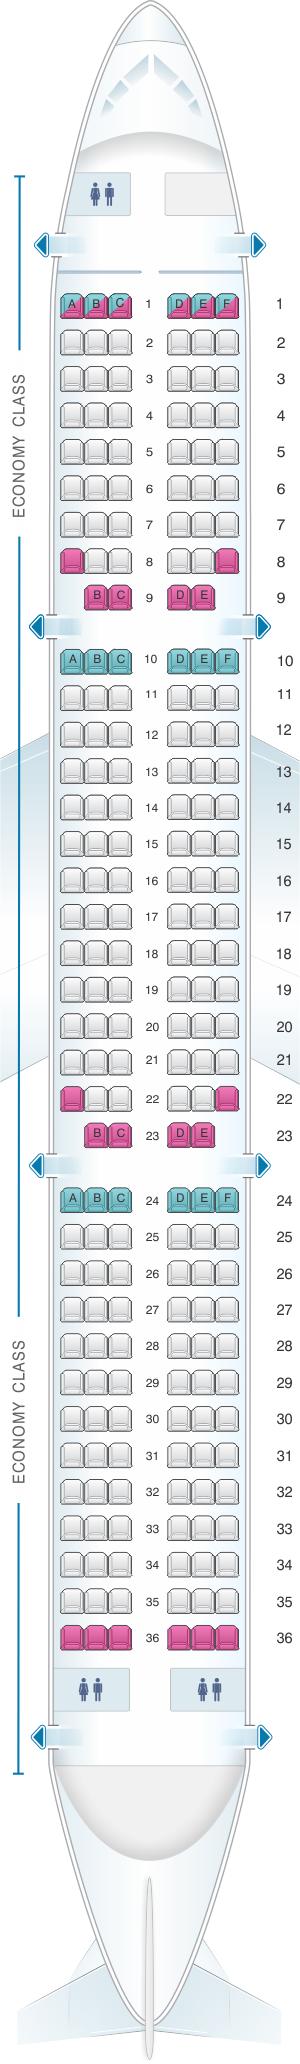 Seat Map Aer Lingus Airbus A321 | SeatMaestro